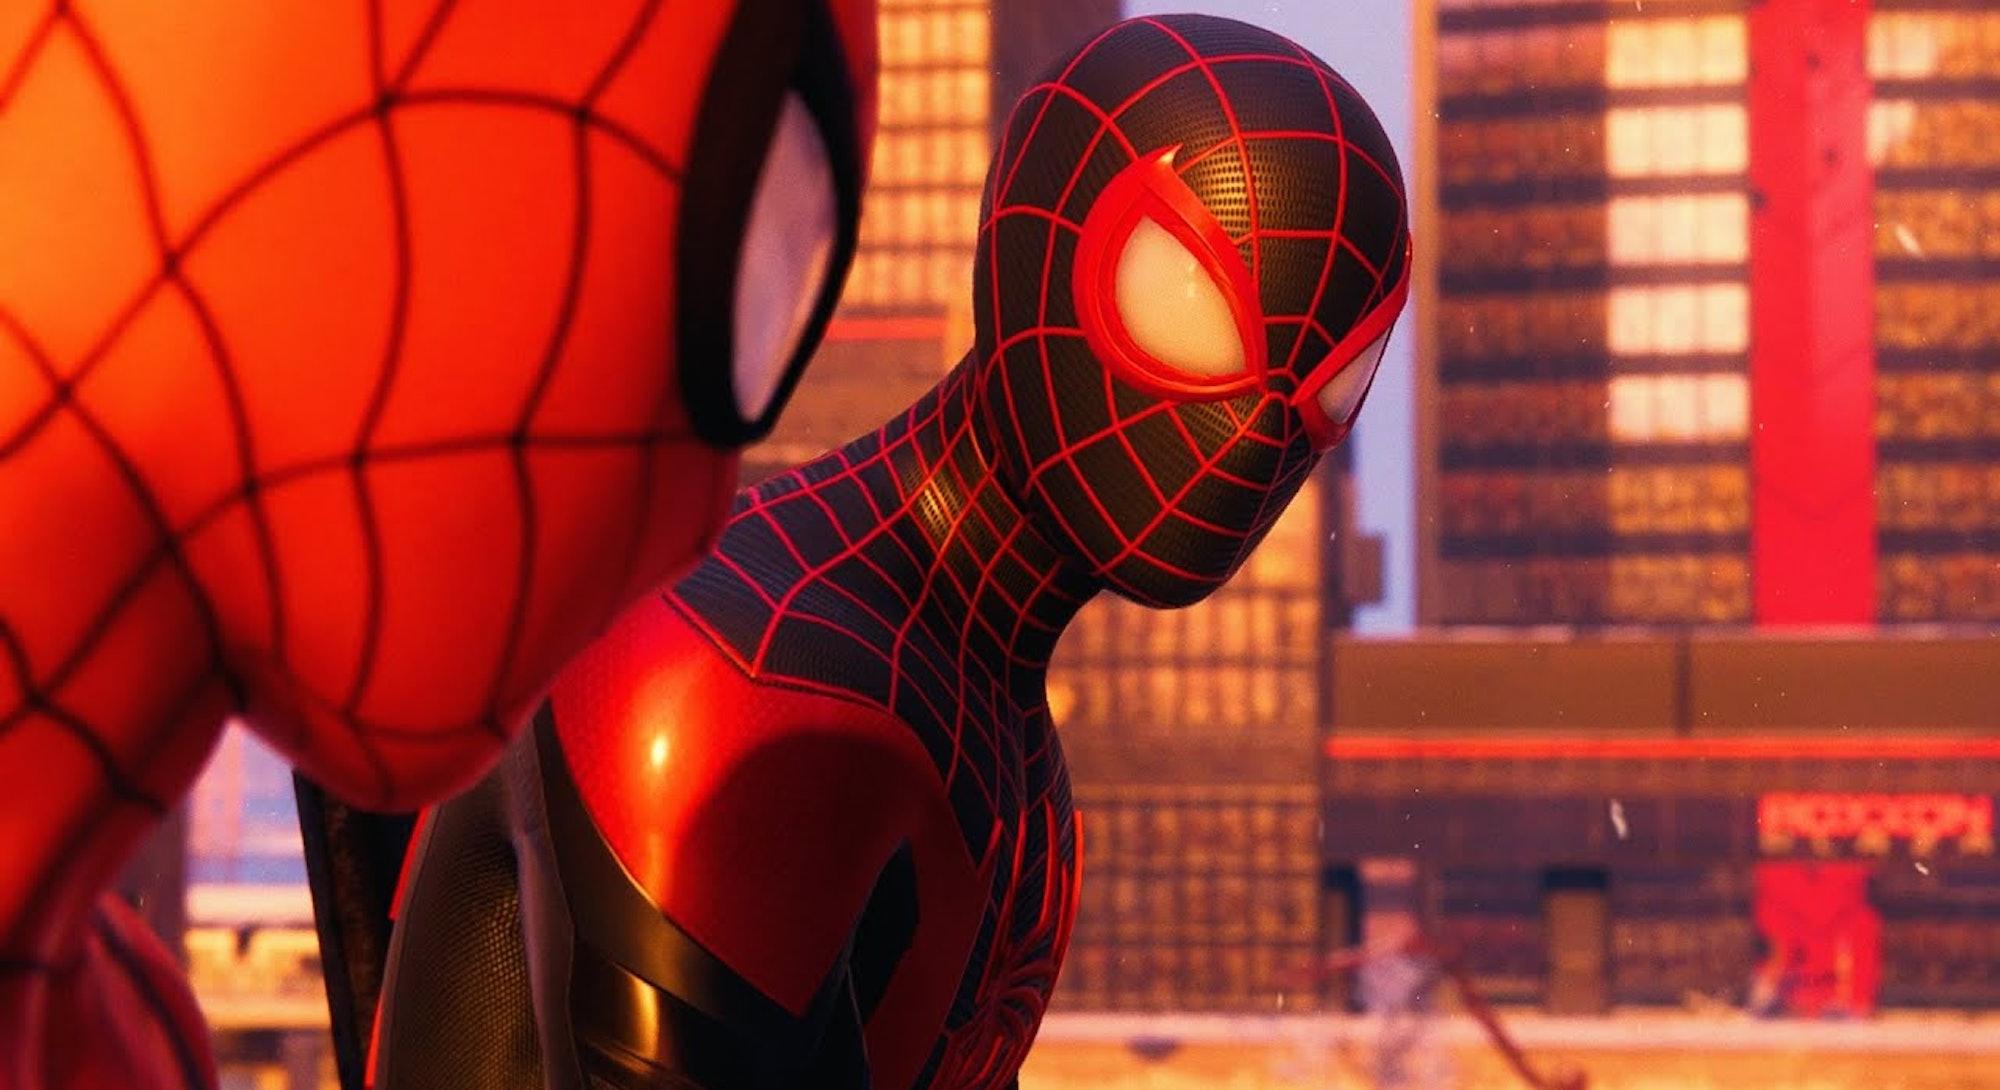 spider man miles morales peter miles